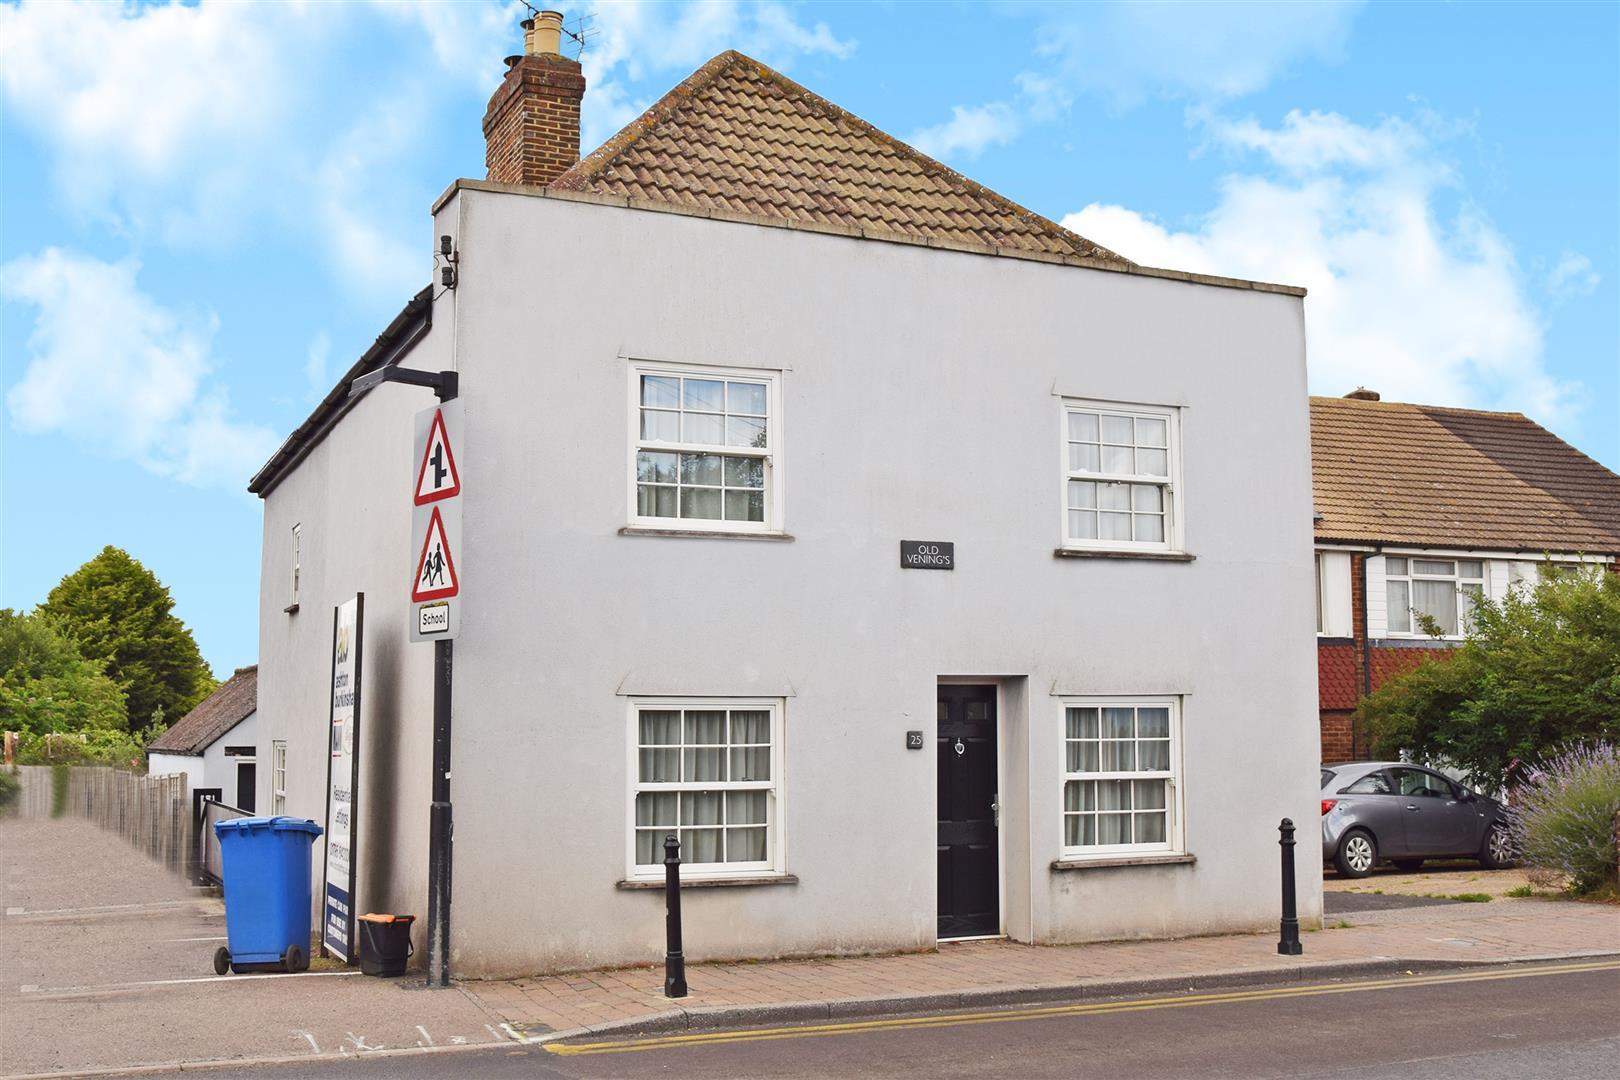 High Street, Newington, Sittingbourne